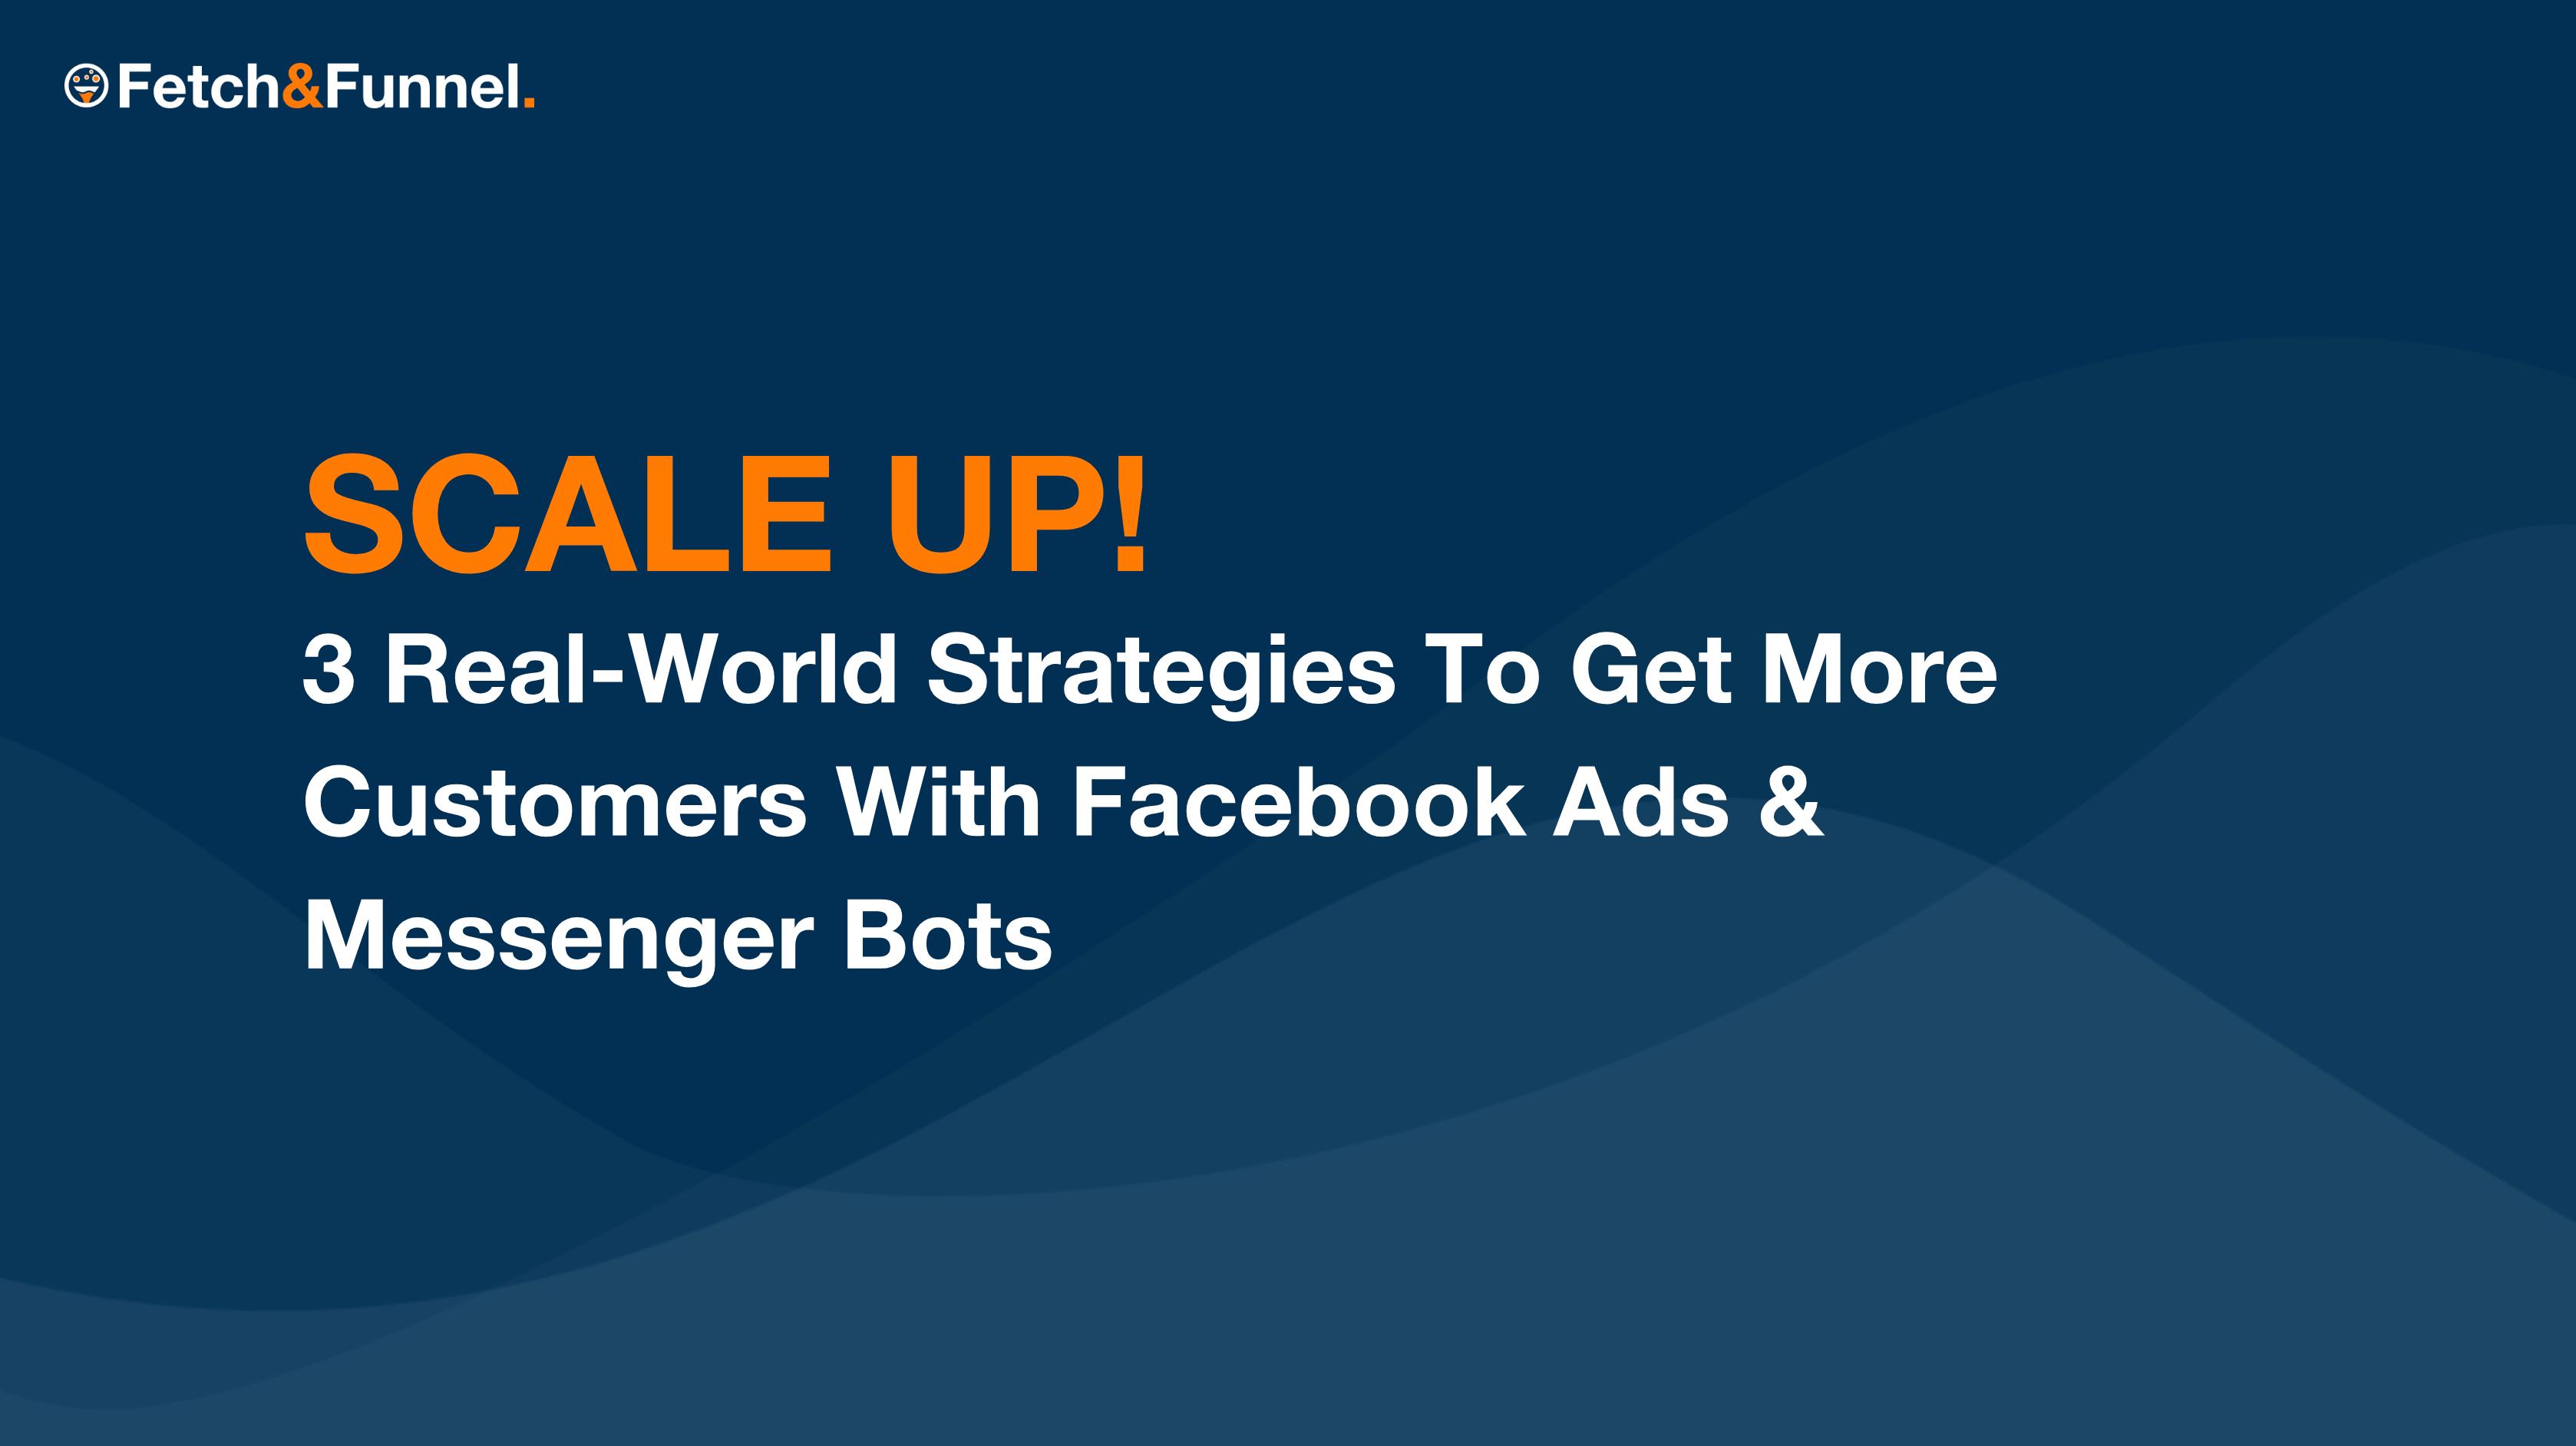 Webinar - Facebook Messenger Marketing - Fetch & Funnel